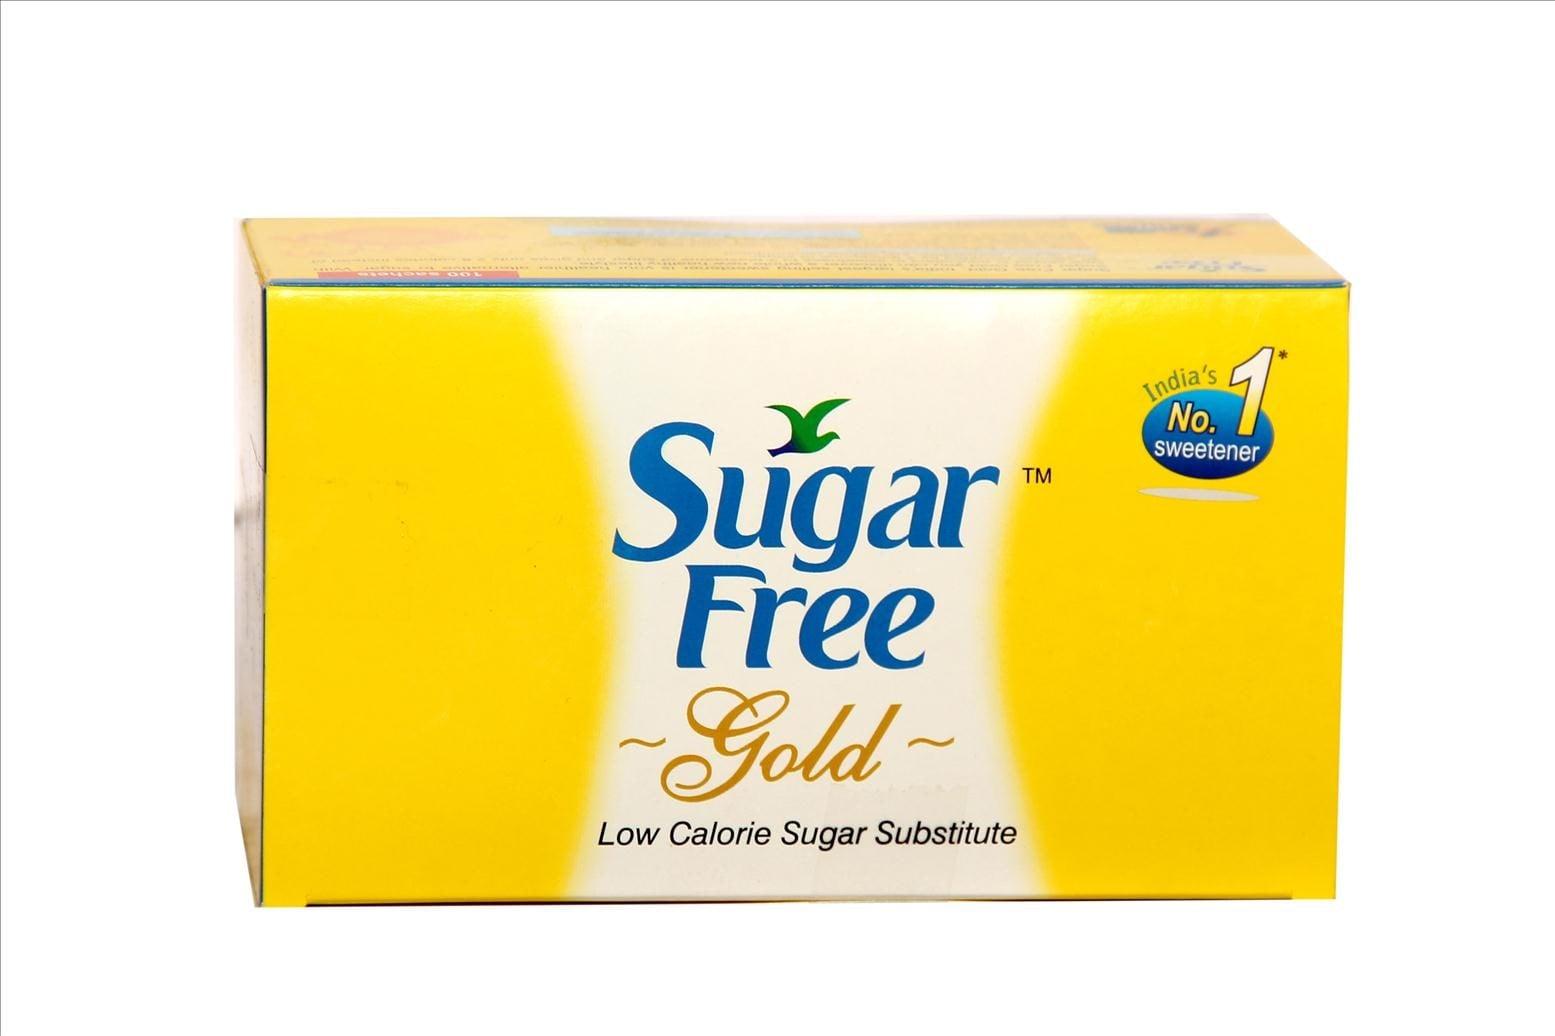 Sugar Free Gold Low Calorie Sugar Substitue